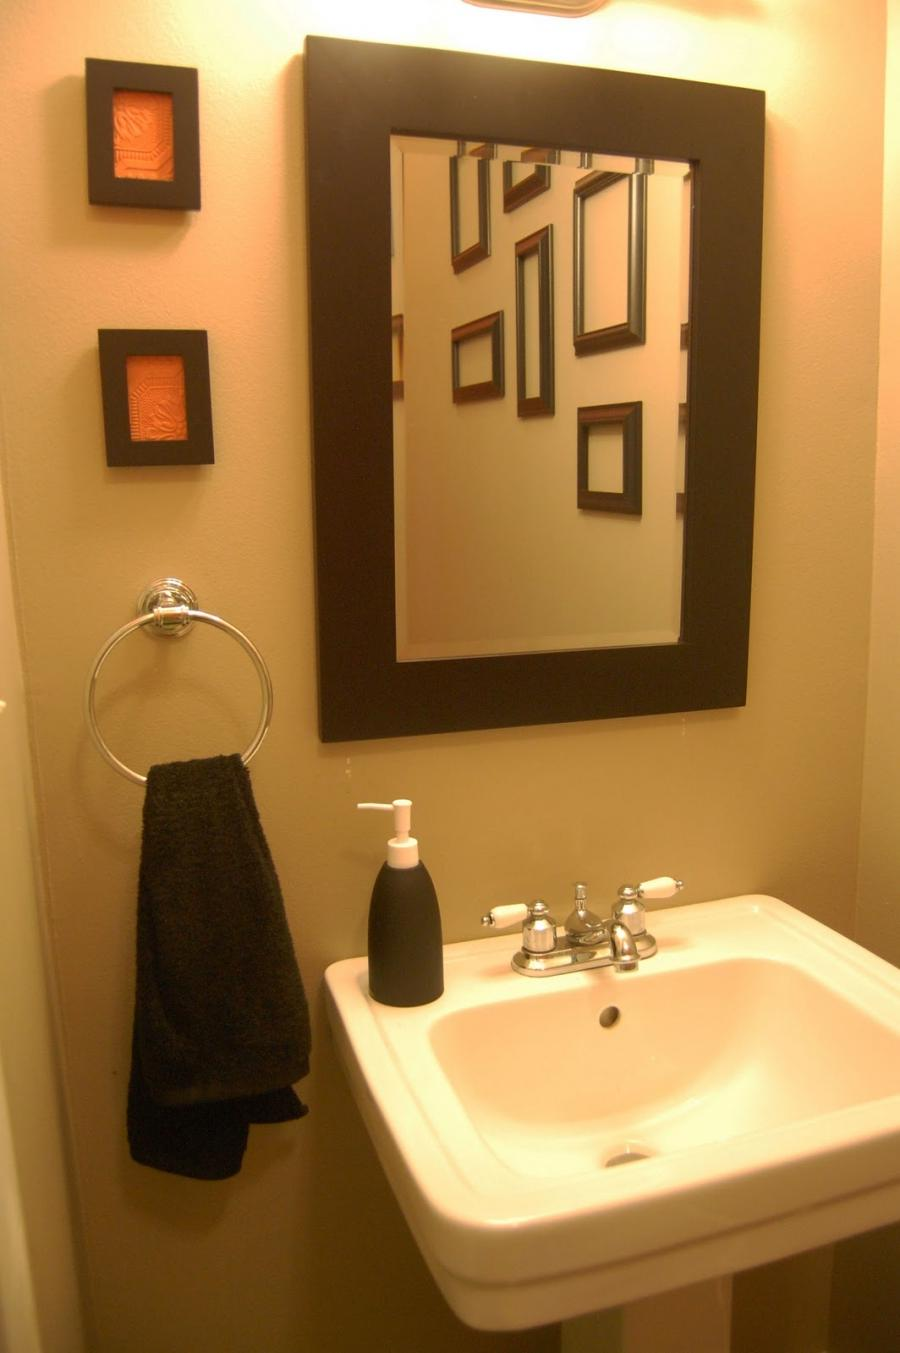 Half bathroom decorating ideas photos for 1 2 bathroom remodel ideas